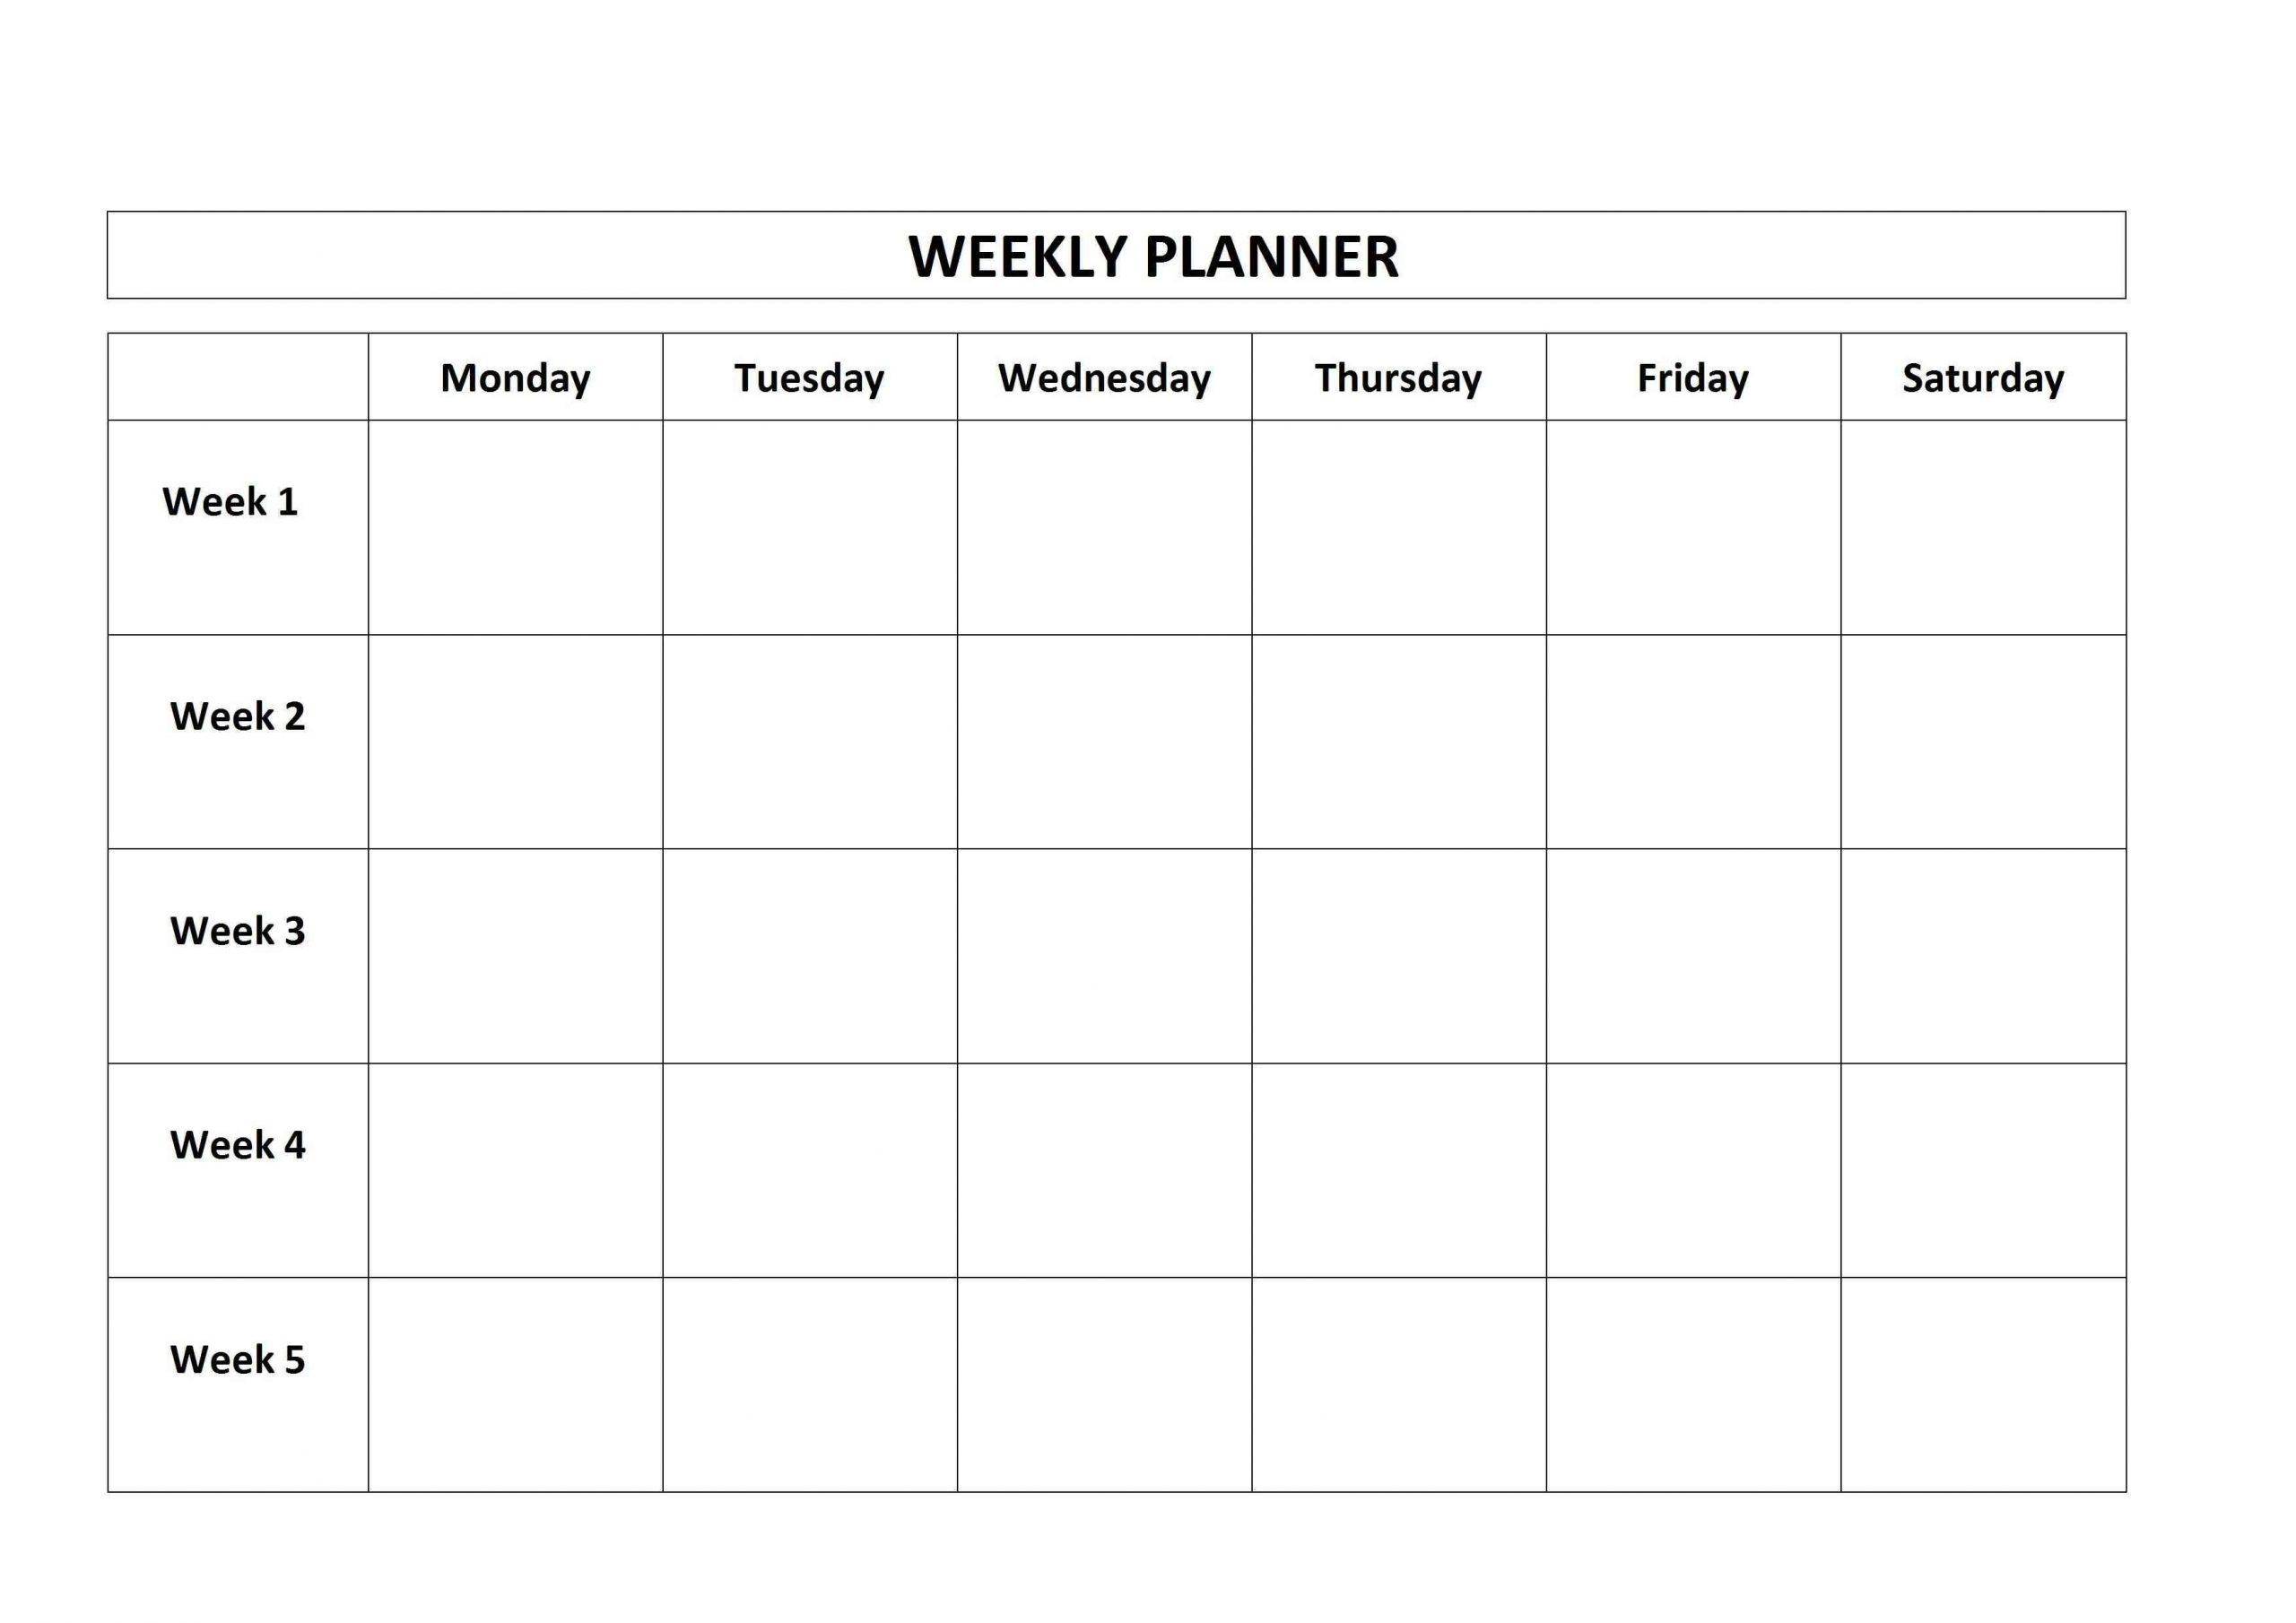 Mon - Friday Weekly Celendar :-Free Calendar Template Free Monthly Printable Calendar Monday Through Friday